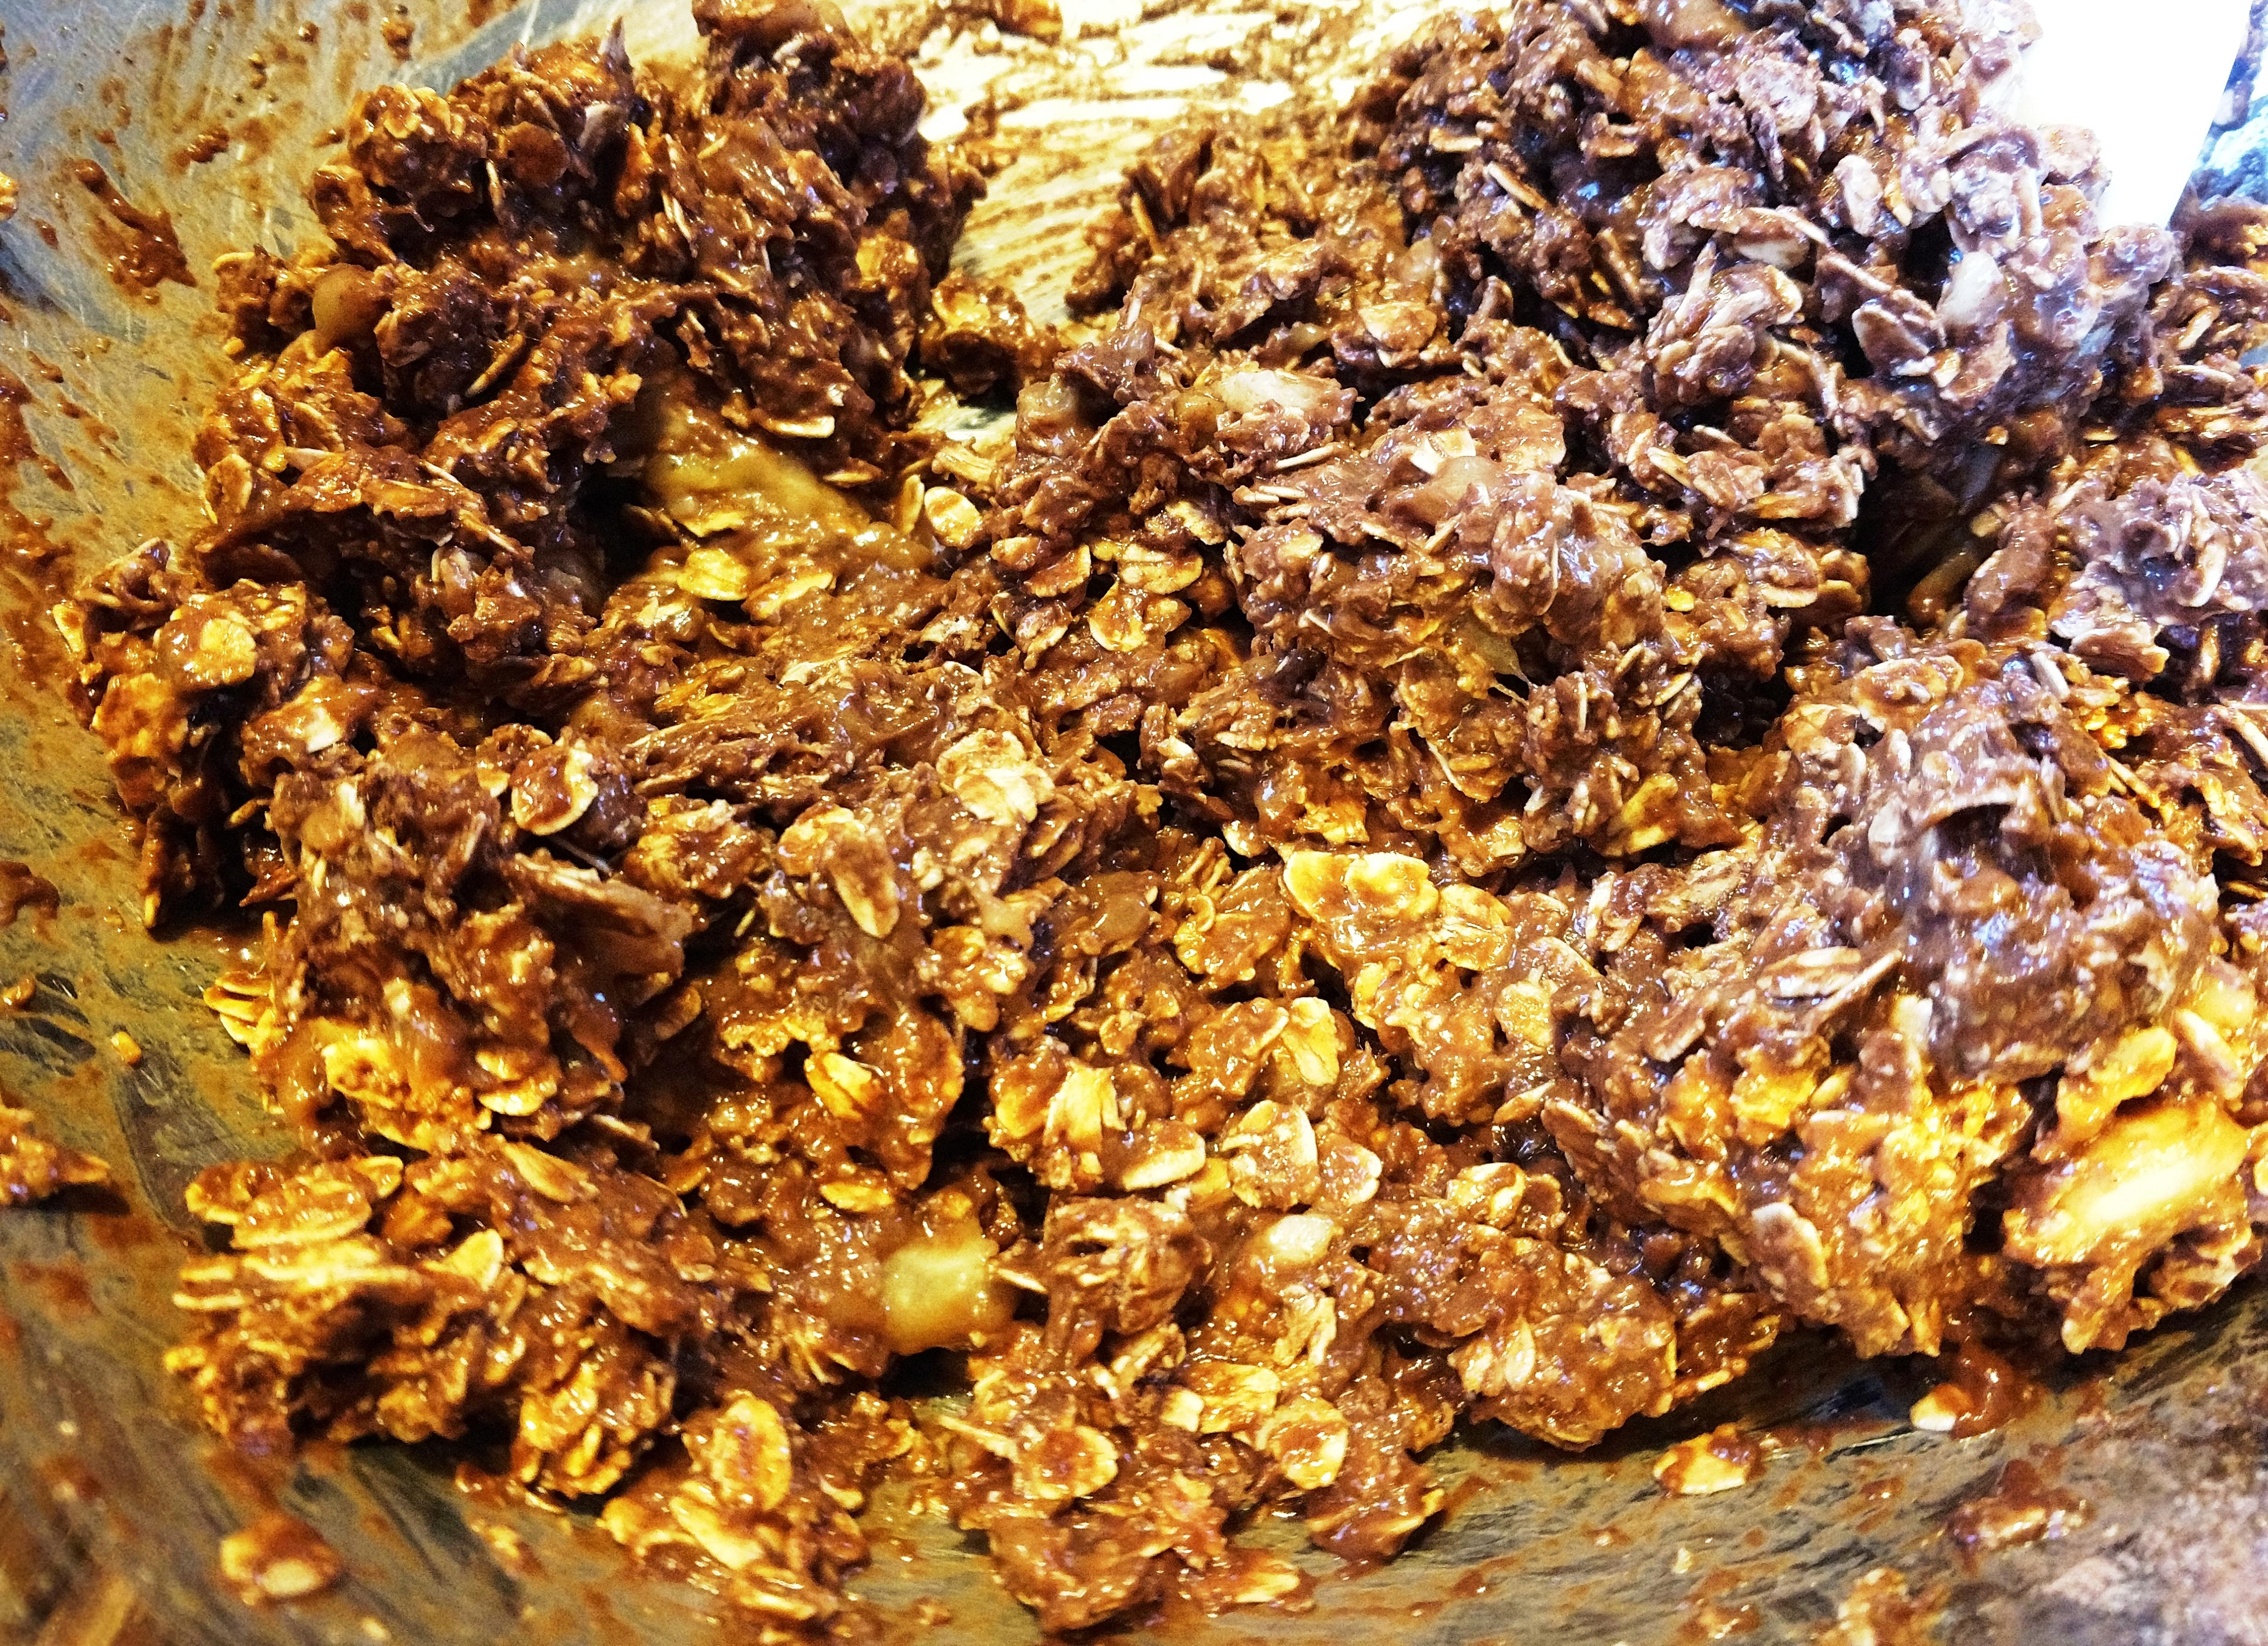 vegan chocolate oatmeal cookies batter